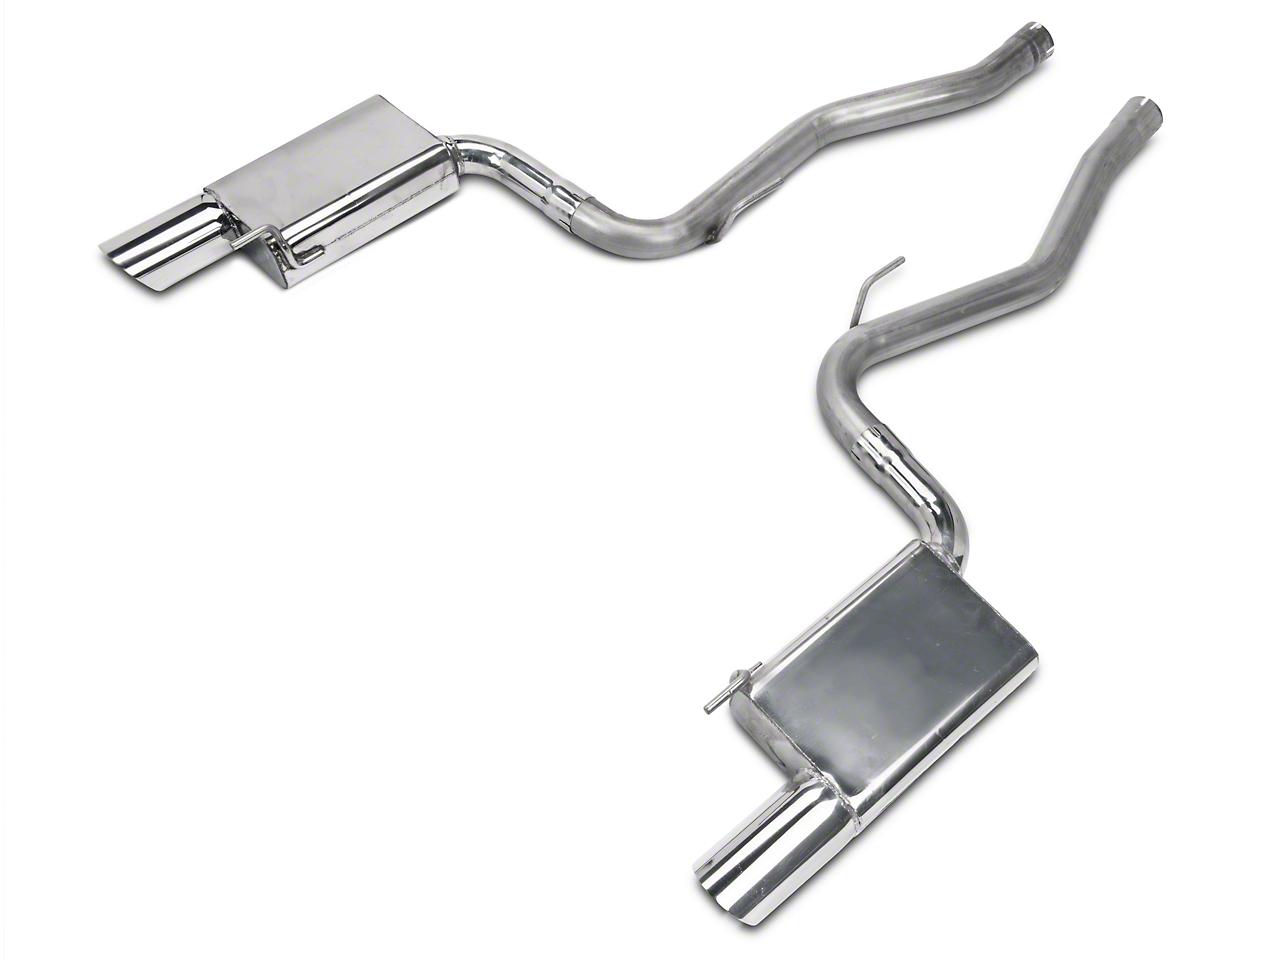 MAC Axle-Back Exhaust (15-17 V6 Fastback)